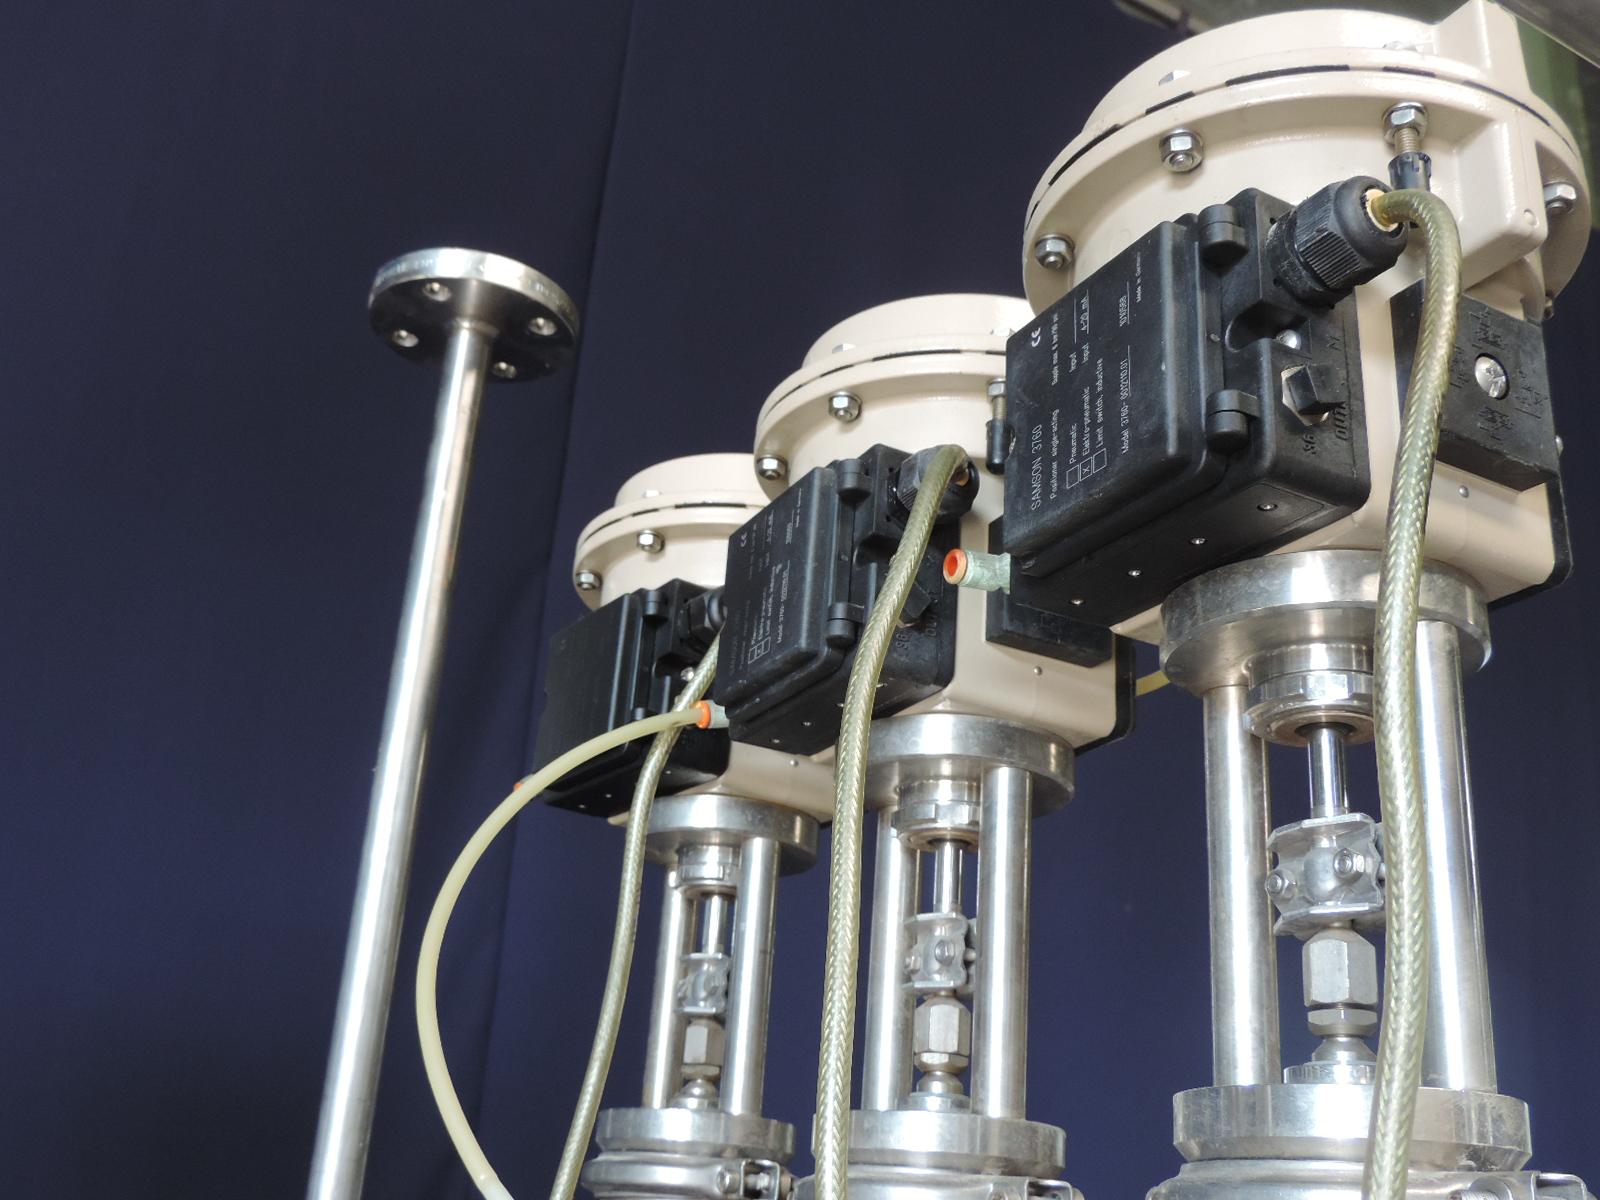 Tetra Pak Alcross M 1x38 Pilot Unidades de filtración (MF/UF/NF/RO)